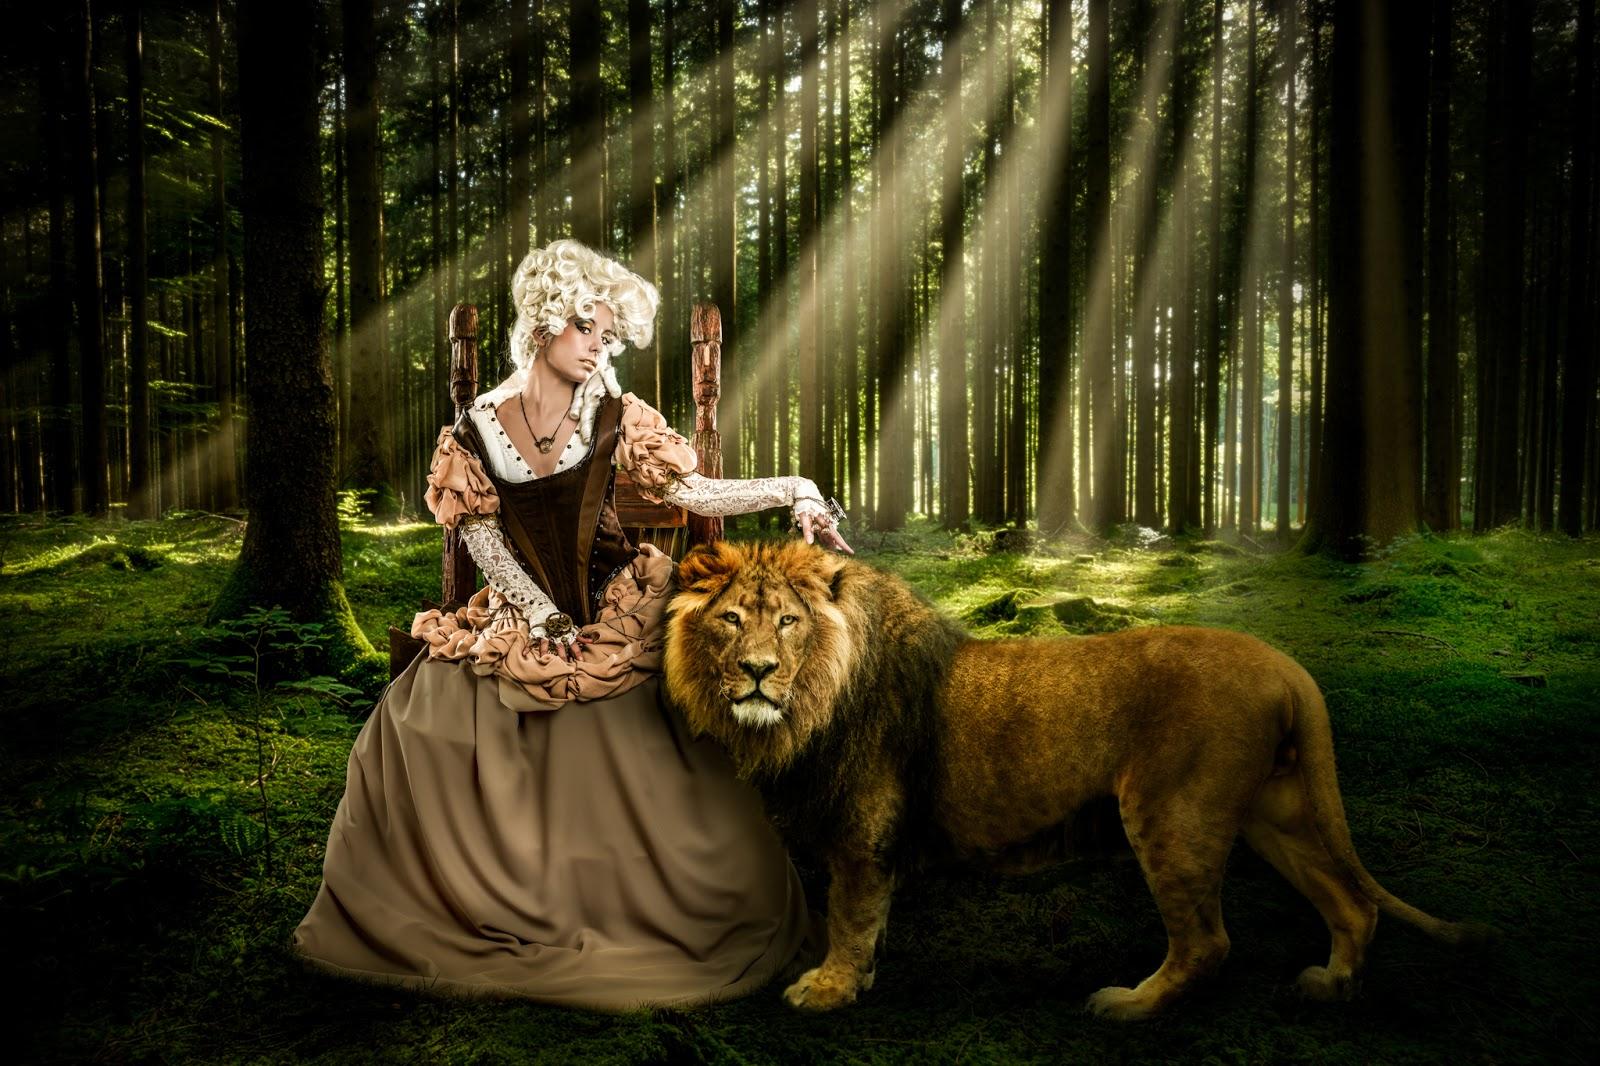 Irati Queen :: Canon EOS 5D MkIII | ISO100 | Canon 50mm | f/9 | 1/200s